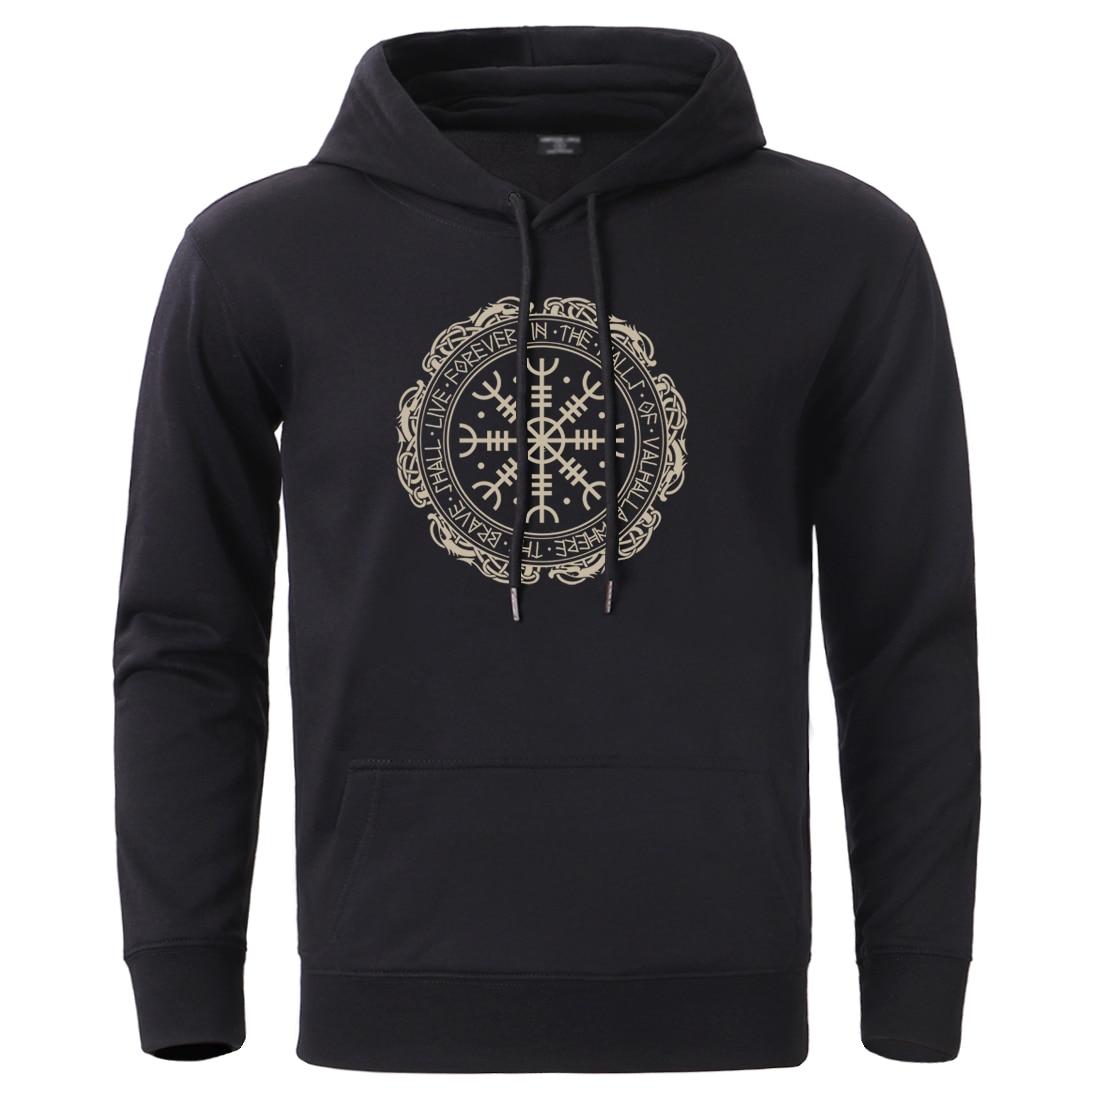 Vikings Sweatshirt Mens Son Of Odin Hoodies Pullover Winter Spring Long Sleeve Gone To Valhalla Black Sportswear Tracksuit Hoody